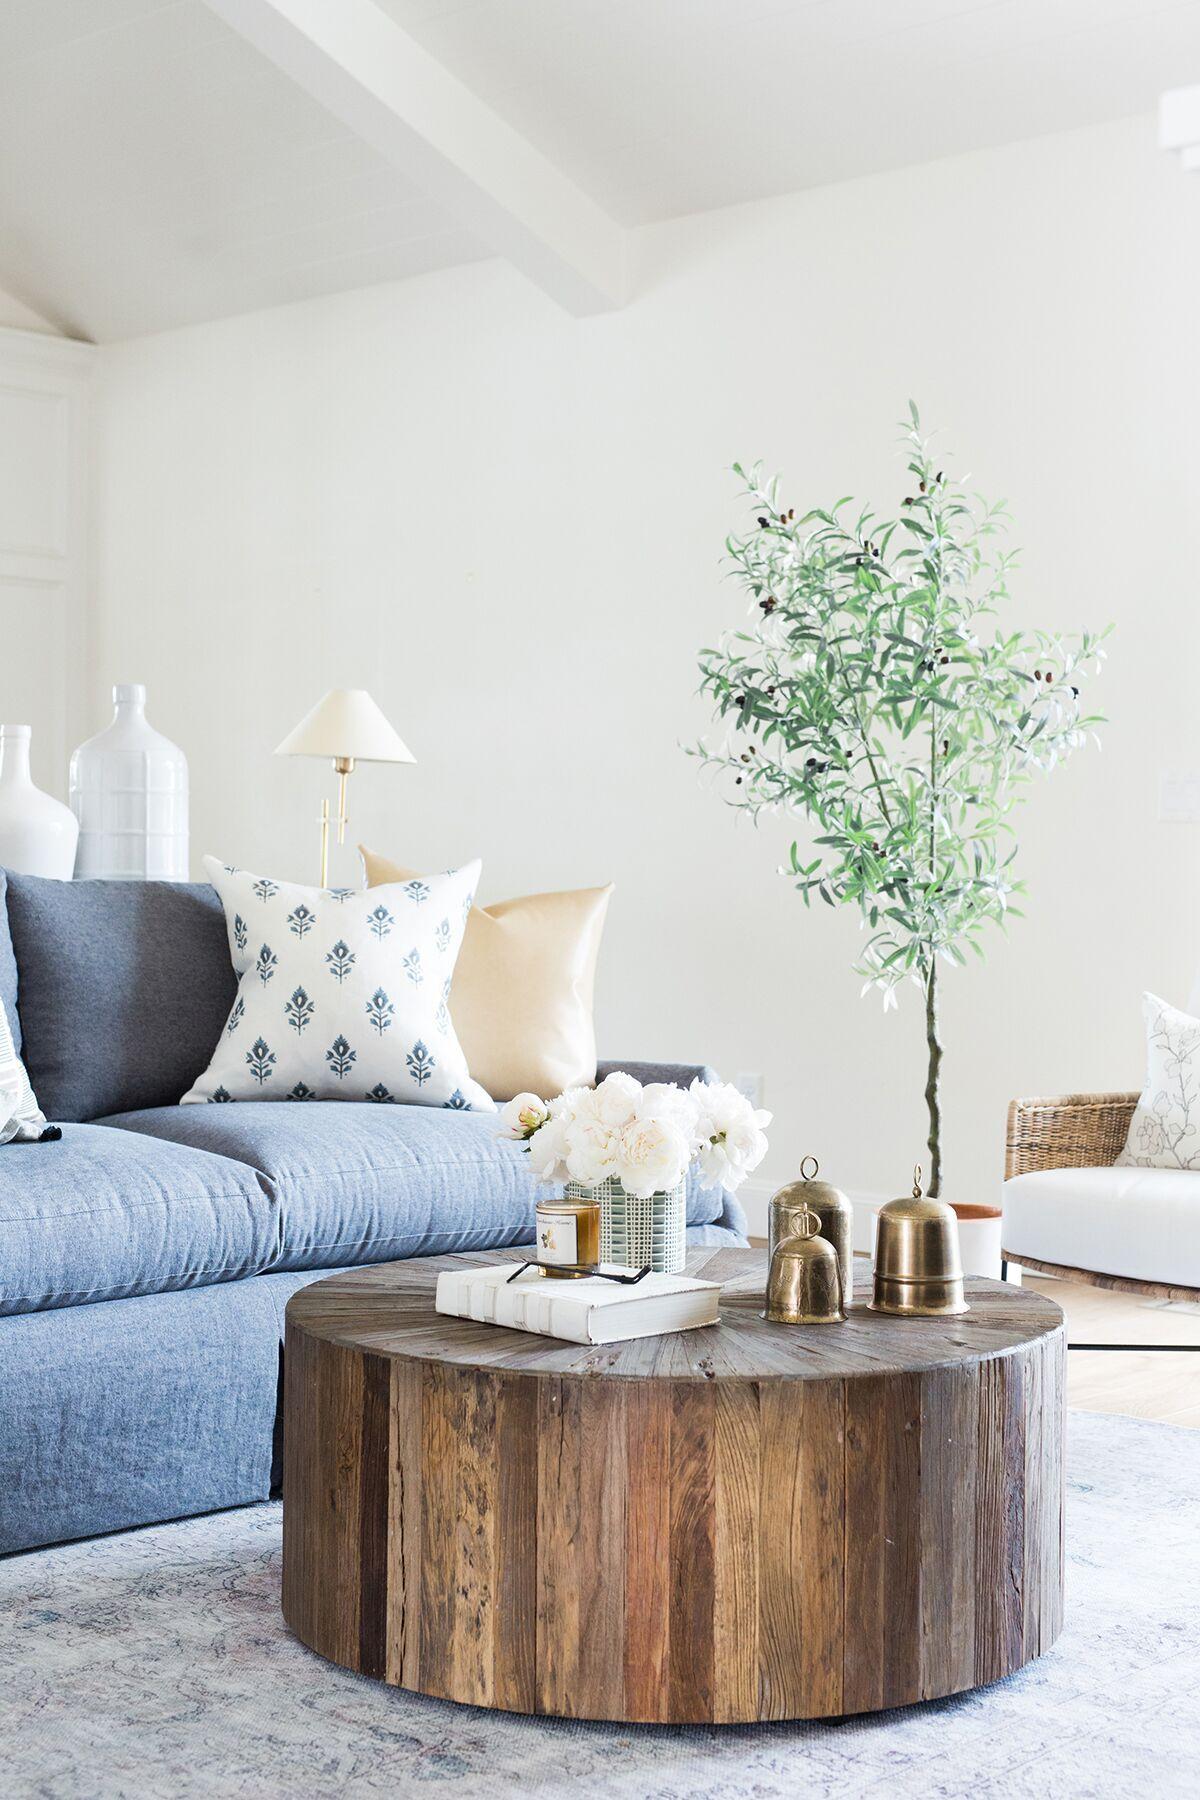 Behind The Scenes Designer Pillow Photoshoot Studio Mcgee Farmhouse Decor Living Room Coffee Table Living Room Decor [ 1800 x 1200 Pixel ]